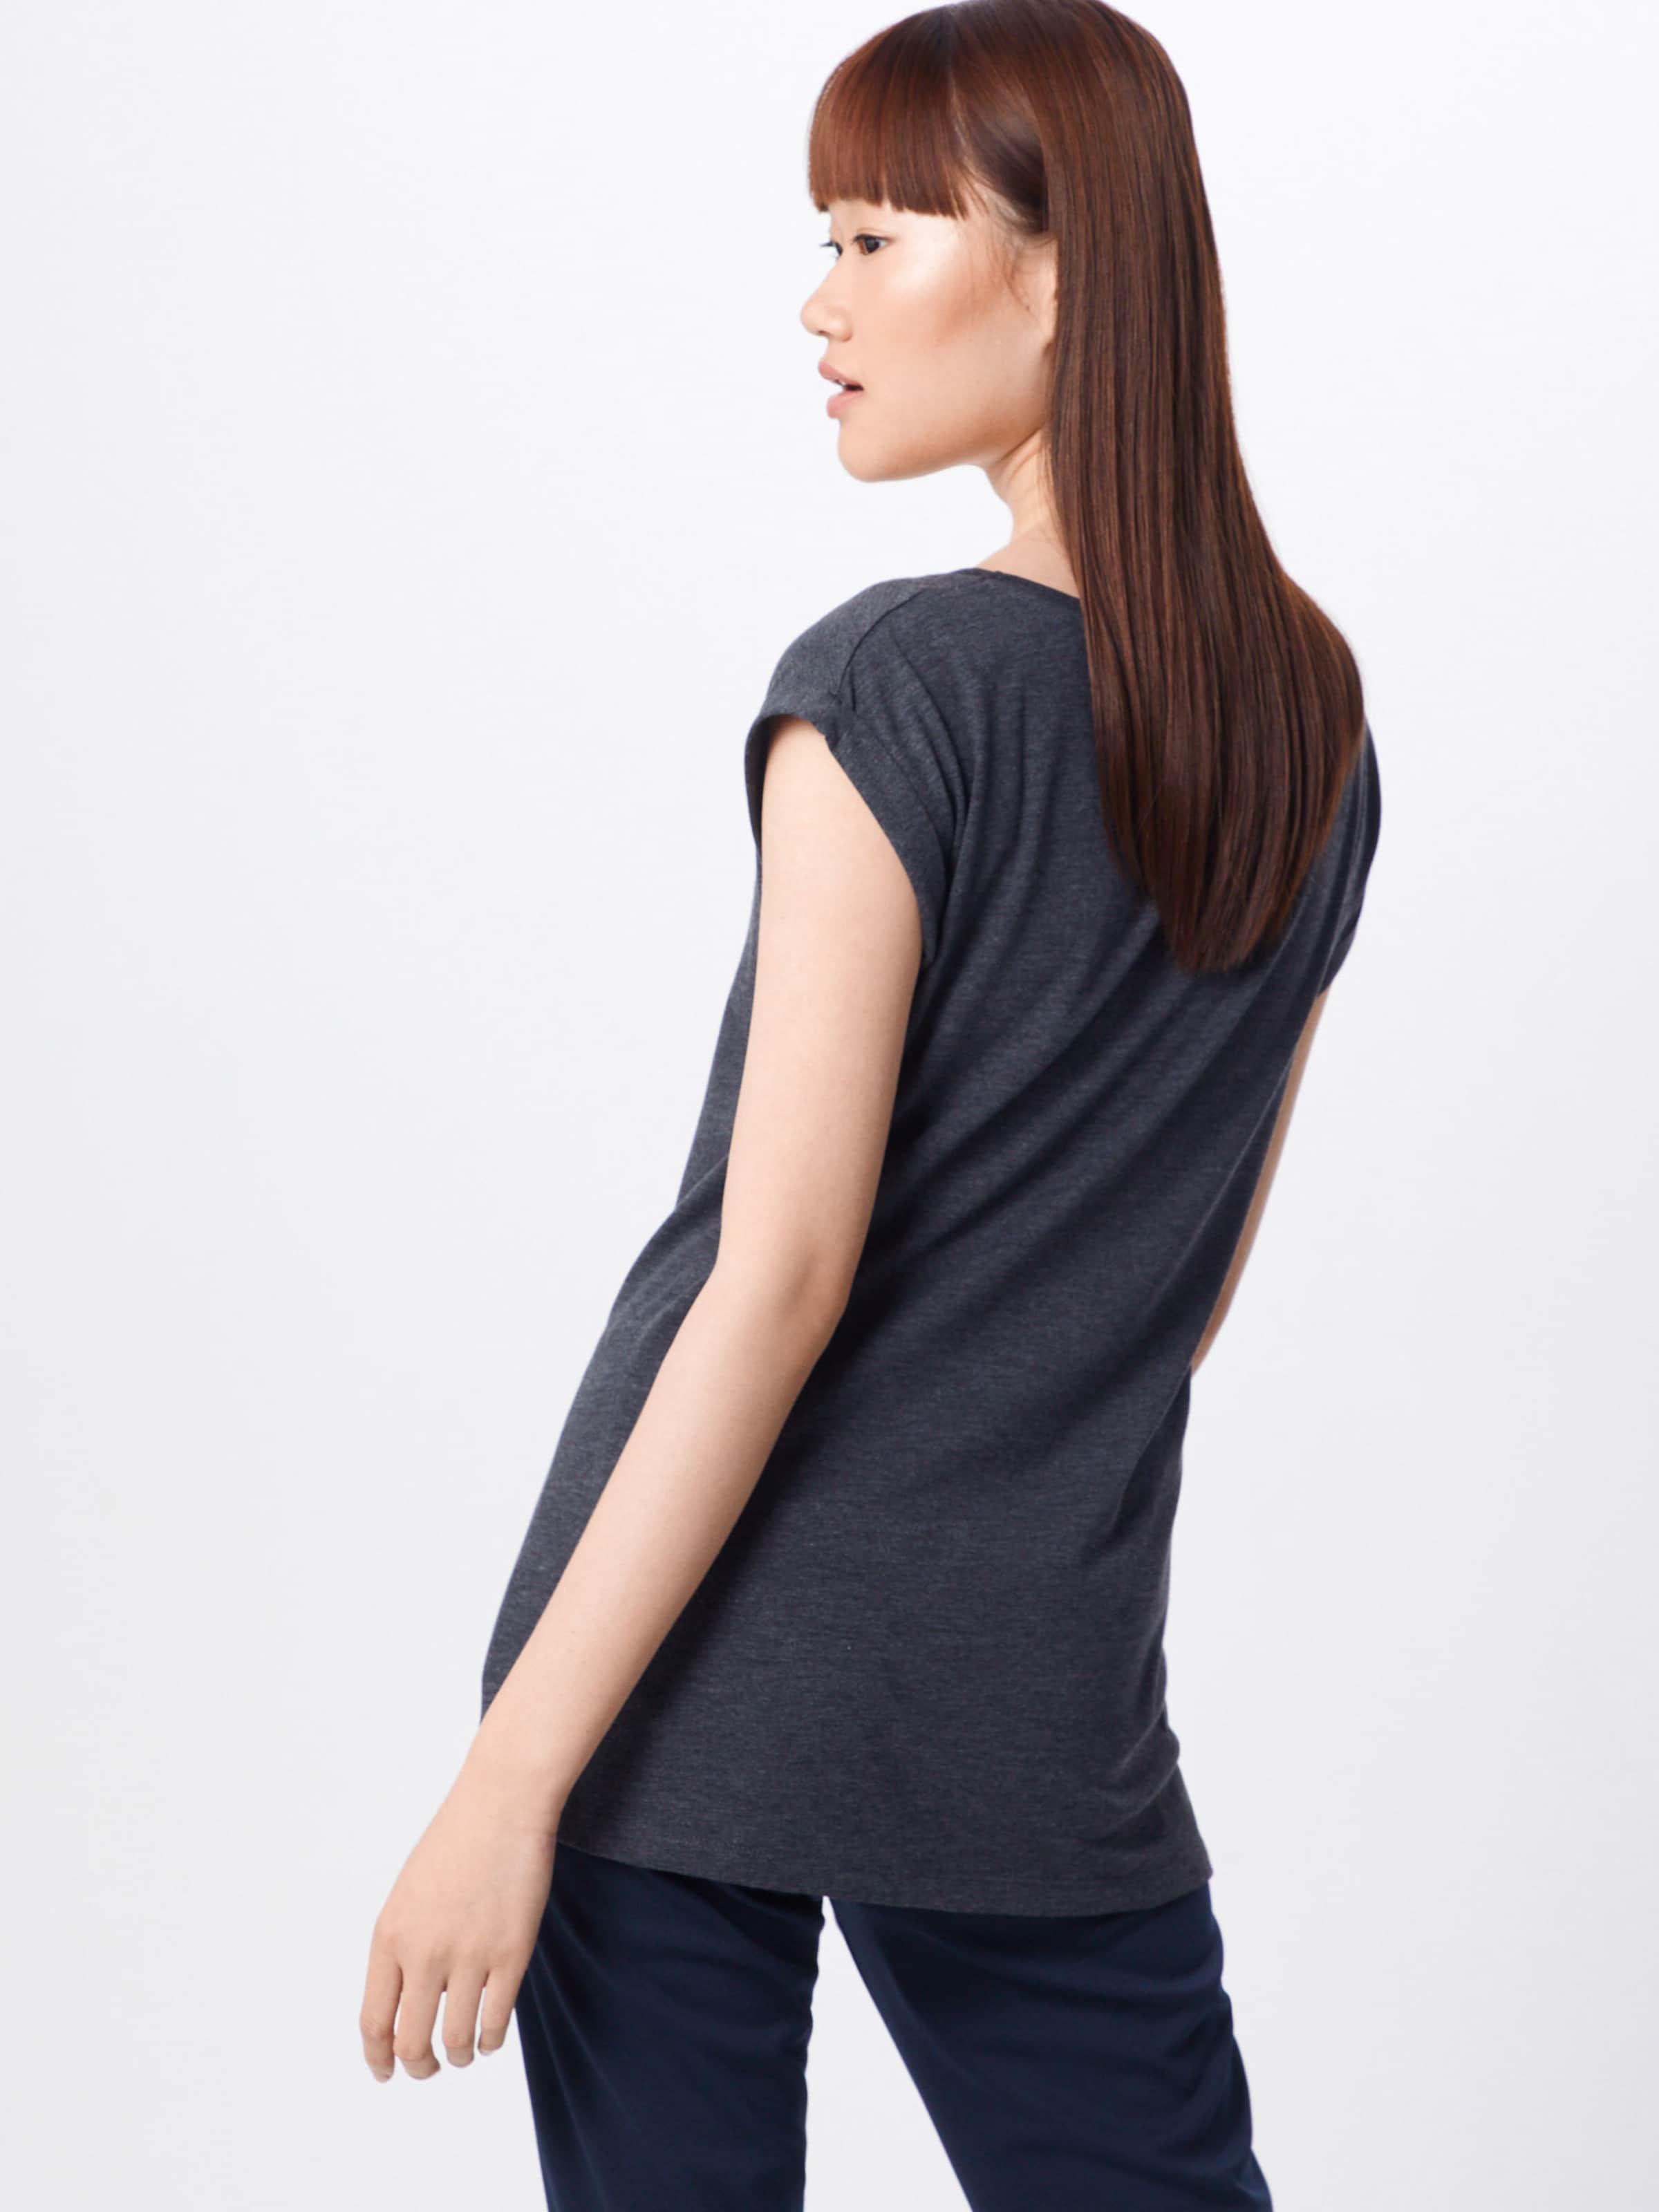 Anthrazit 'evolution' In Iriedaily T shirt 5RL3qjA4Sc